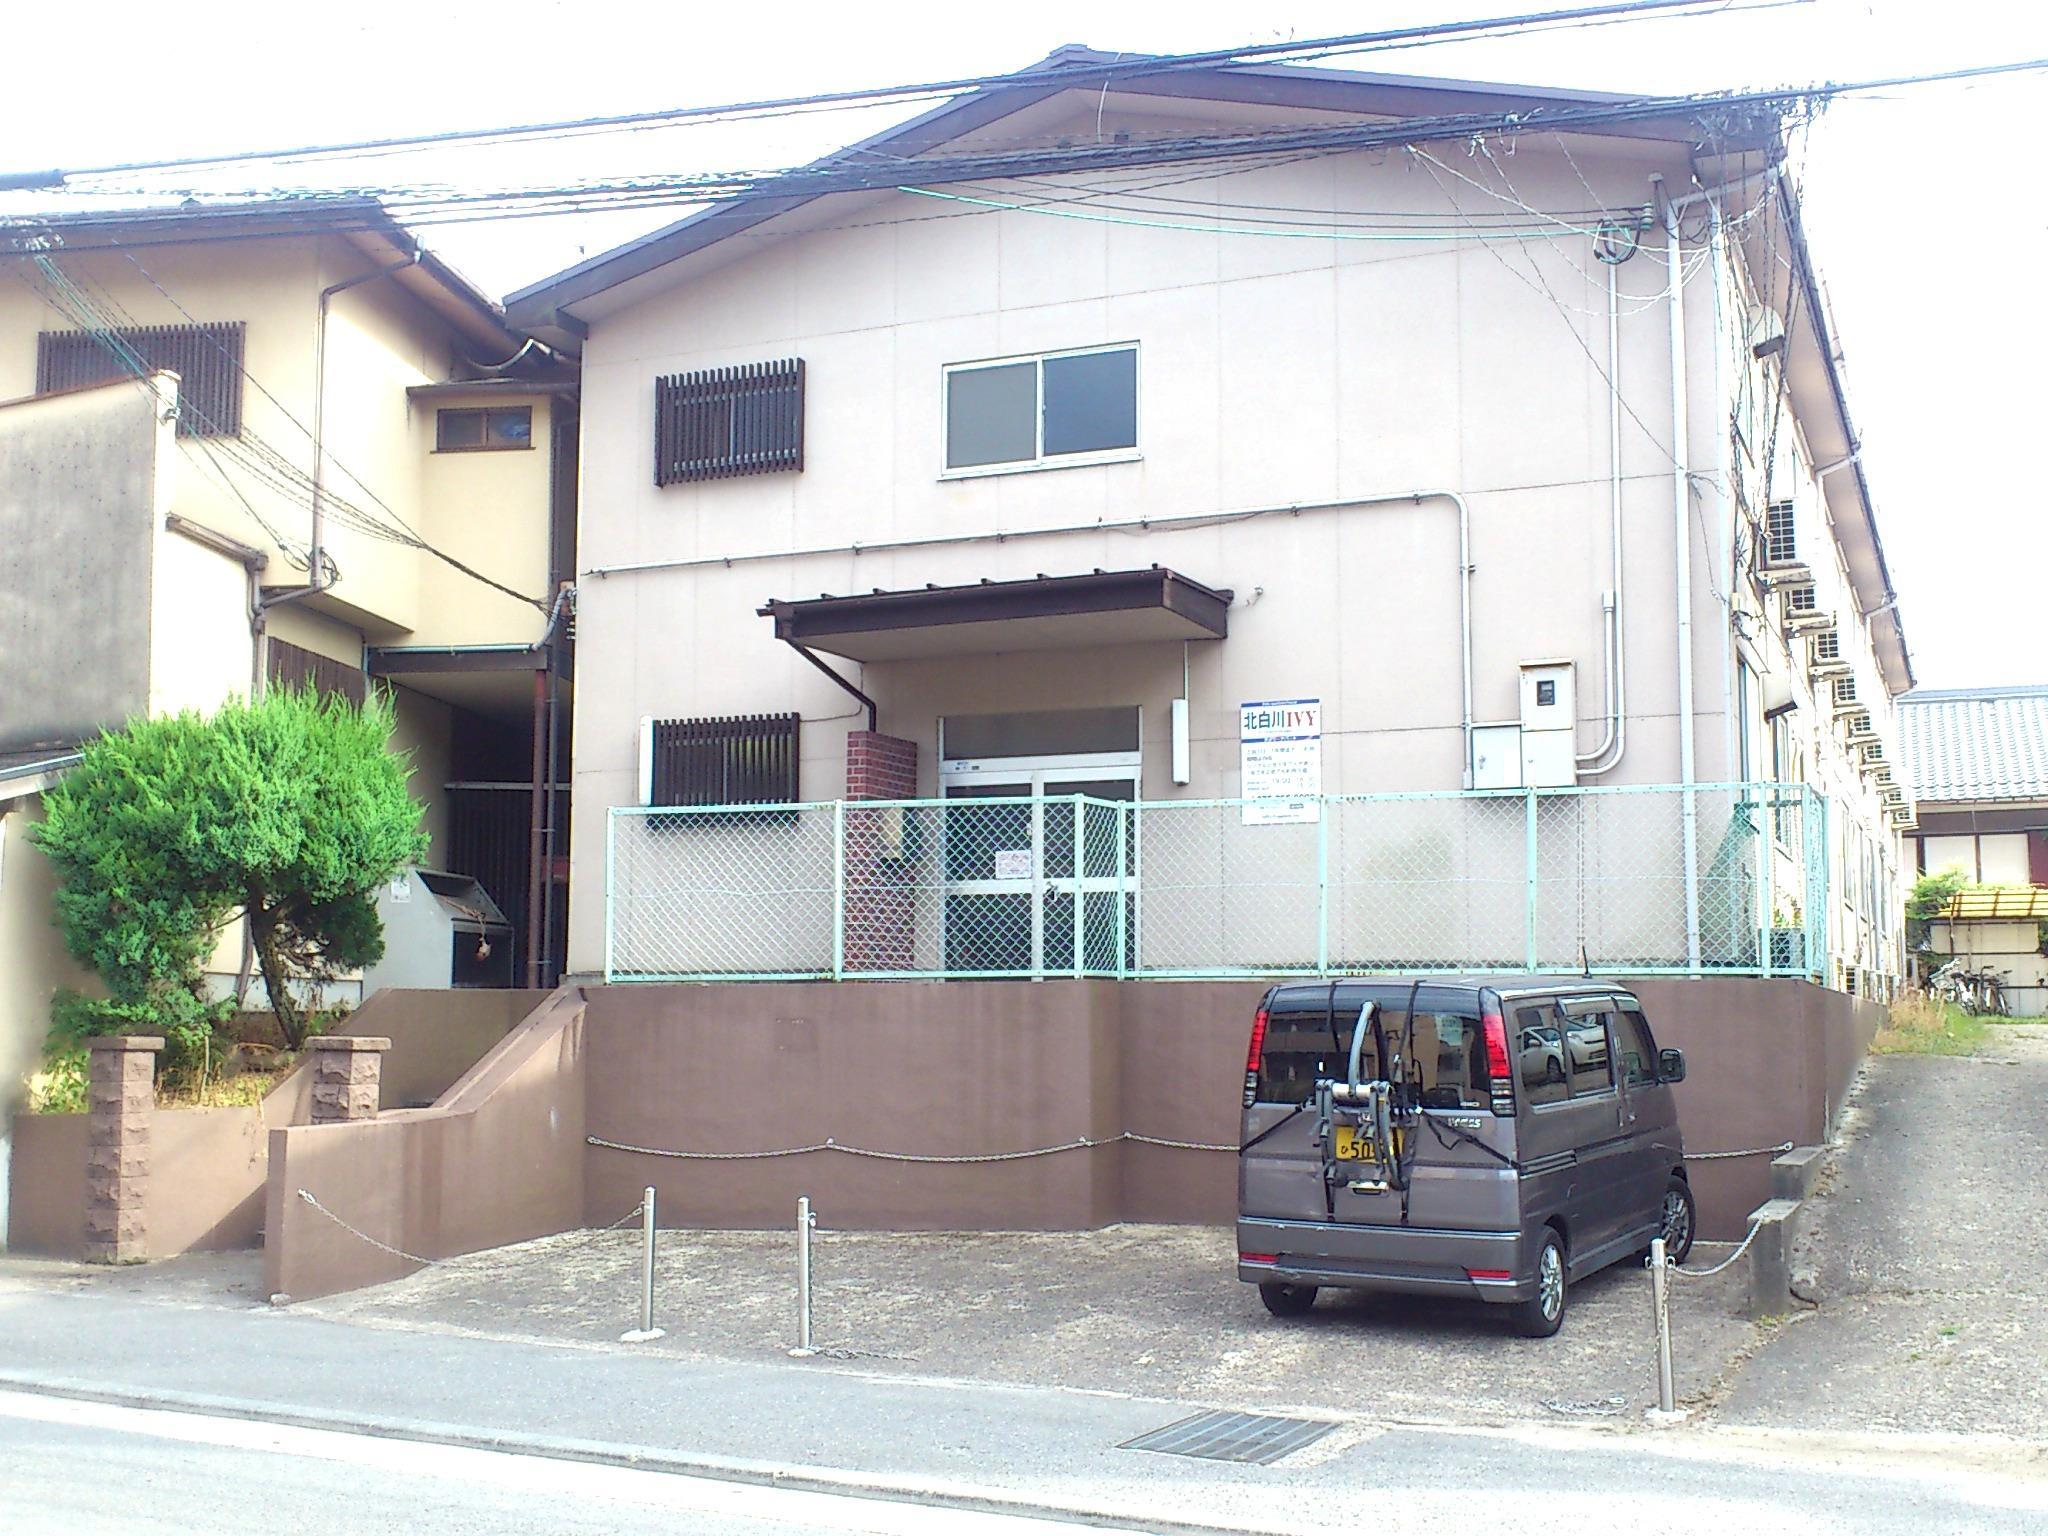 Daily Apartment House Kitashirakawa IVY